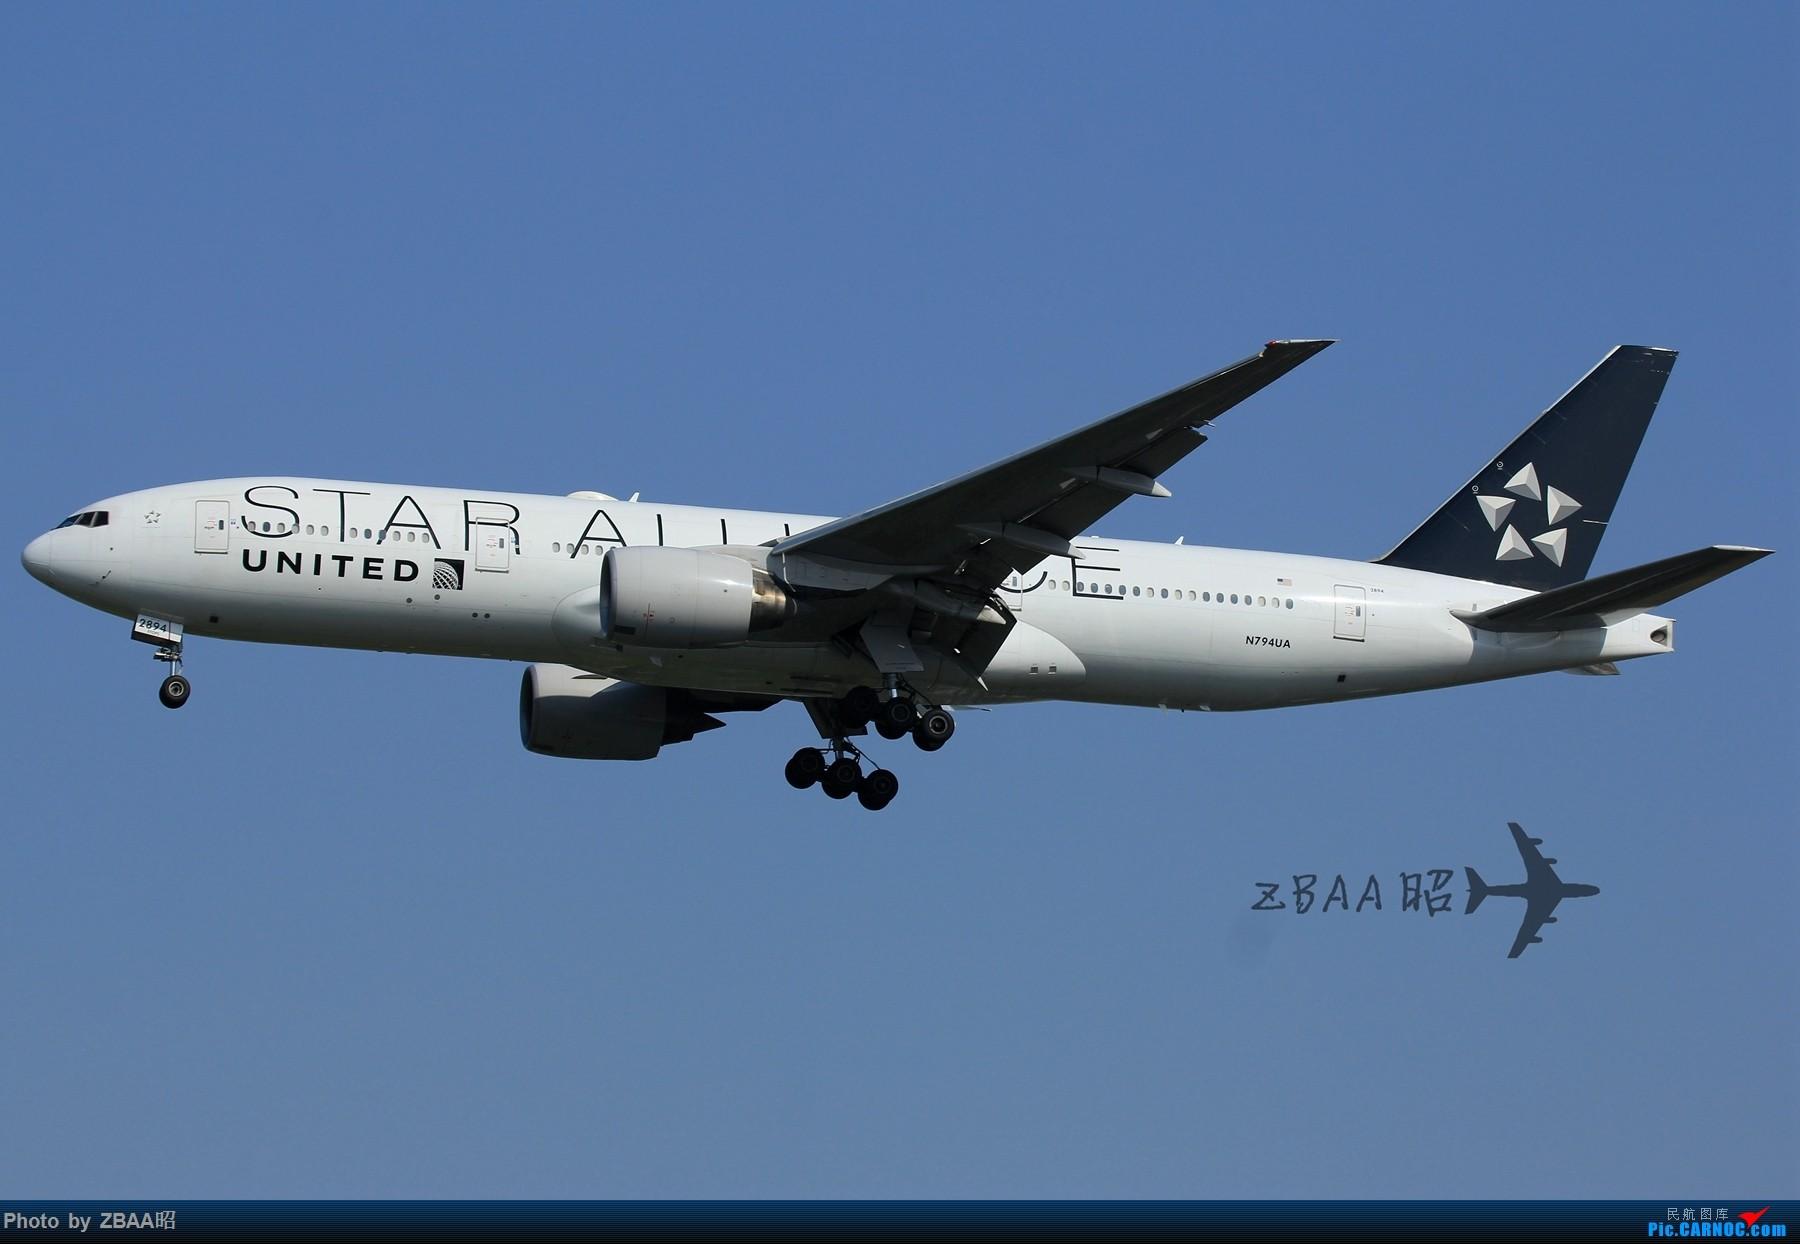 Re:[原创]今日ZBAA 36R跑道接连三枚好货:南航天合 越南772 美联772星星 BOEING 777-200ER N794UA 中国北京首都国际机场